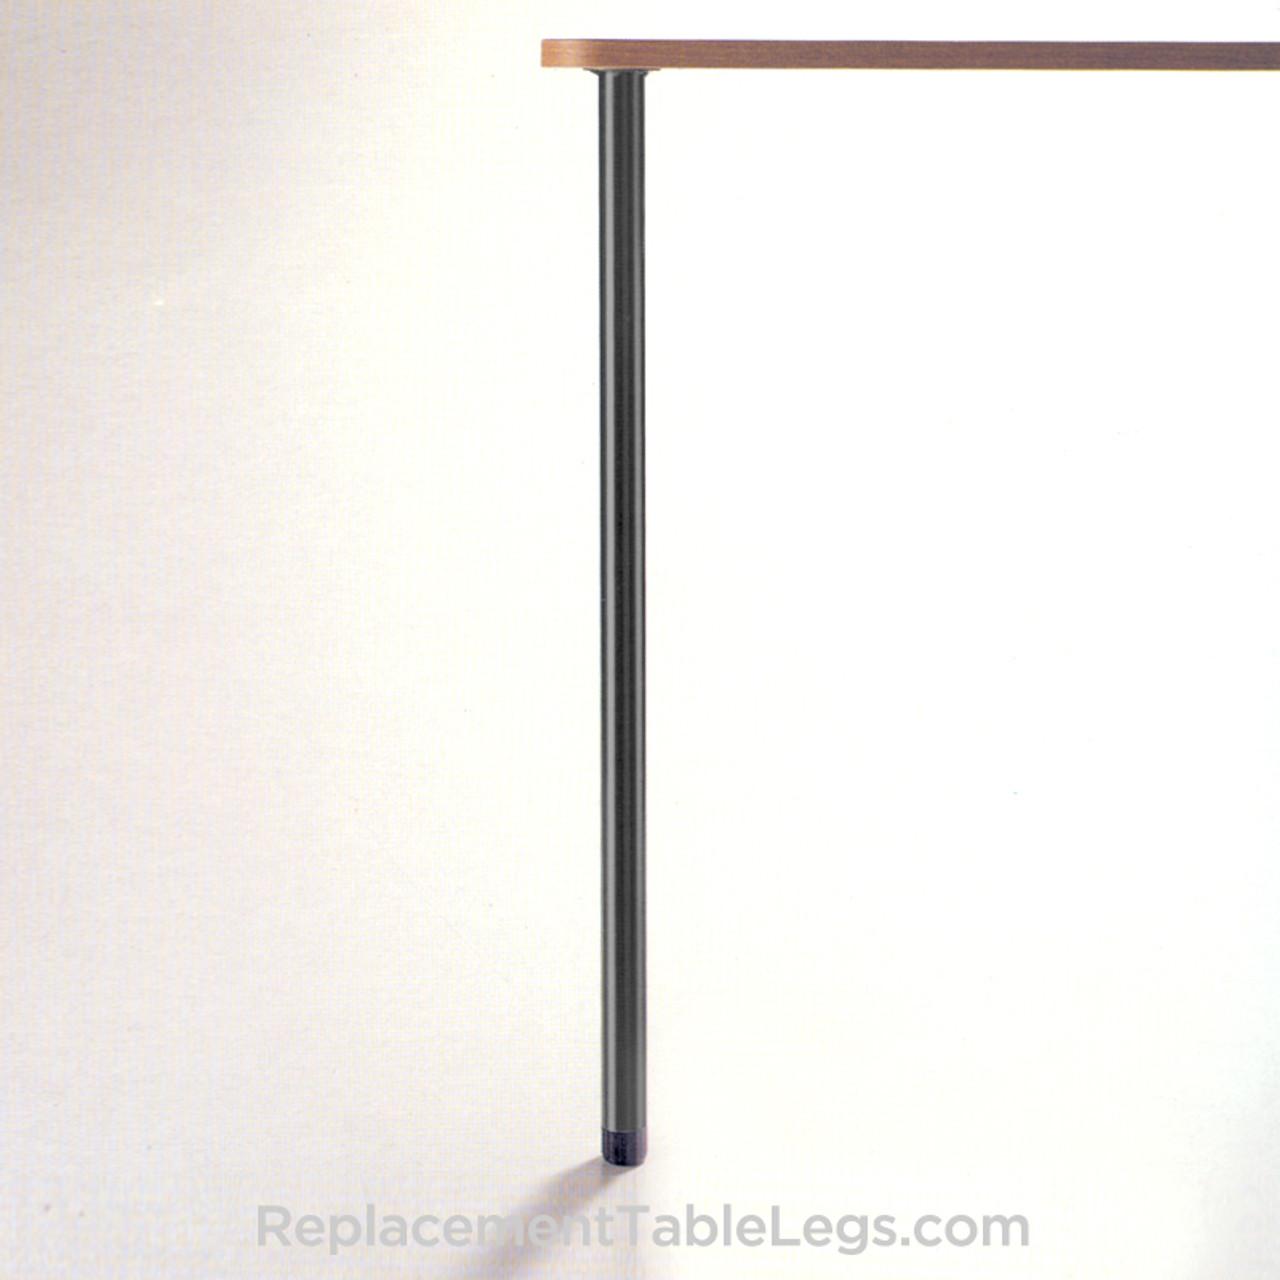 "Slim Table Legs, 27-3/4"" table height, 1-3/8"" diameter, 1"" adjustable foot, black matte - replacementtablelegs.com"